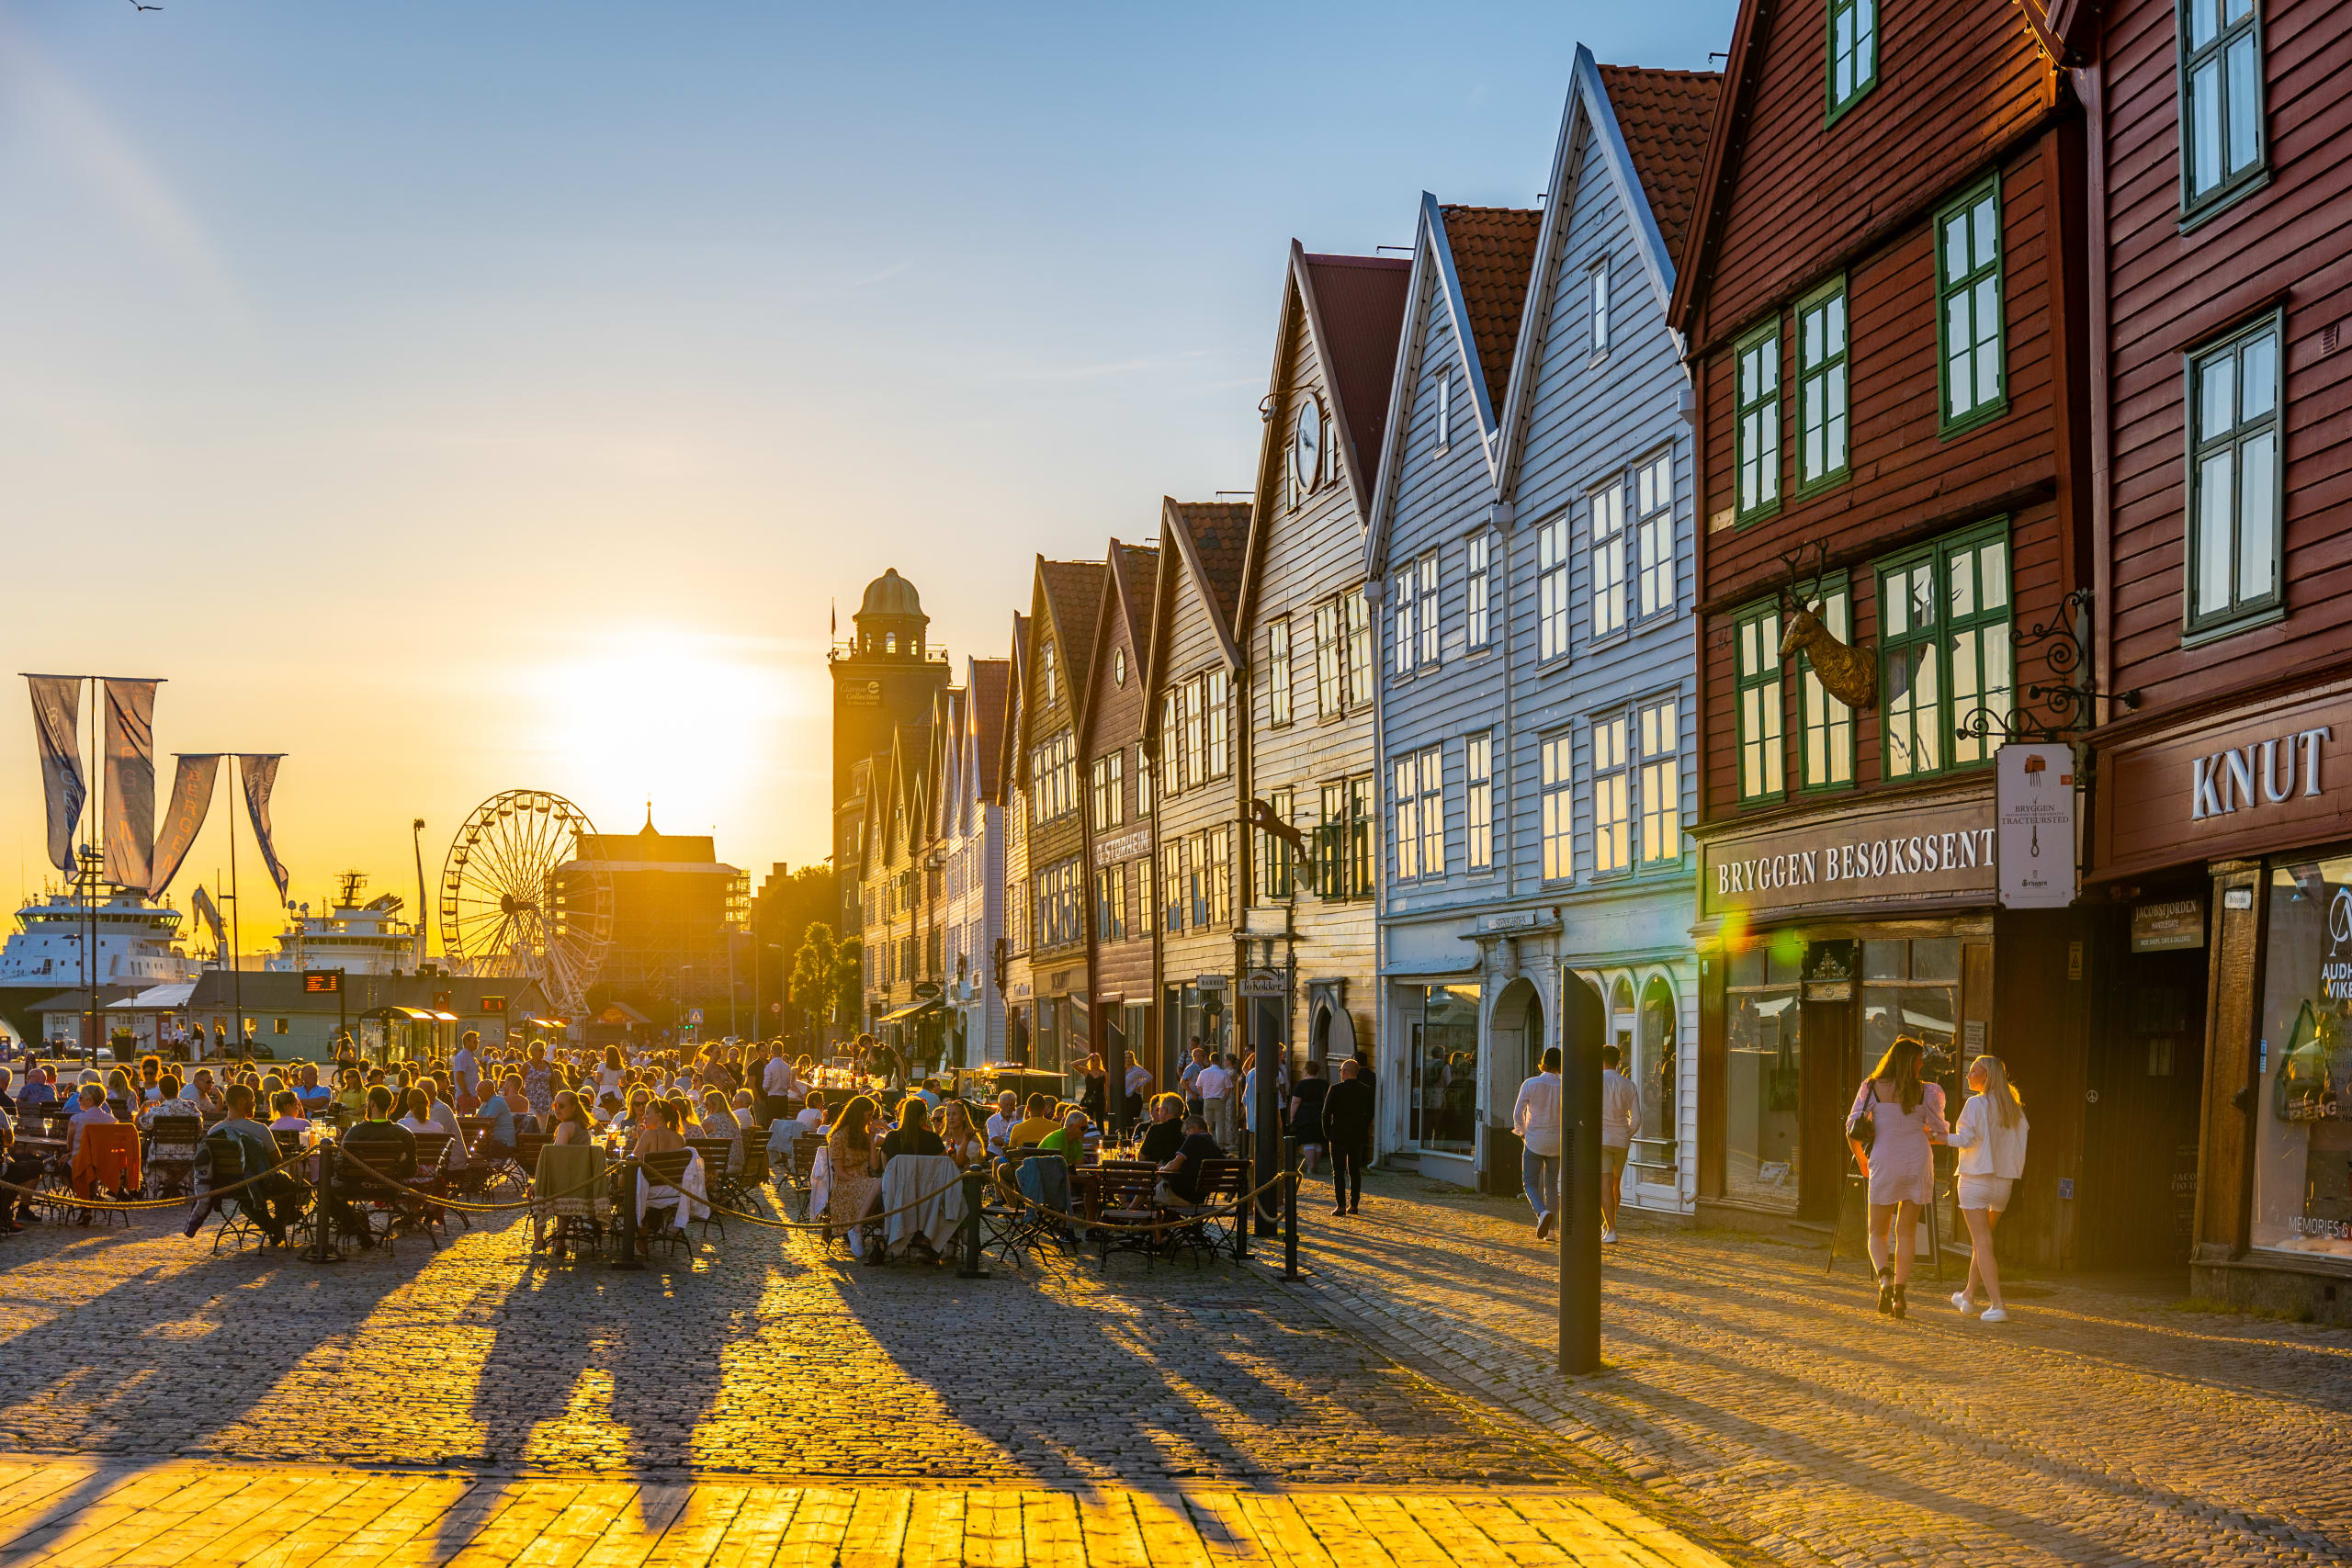 Magic hour at Bryggen in Bergen